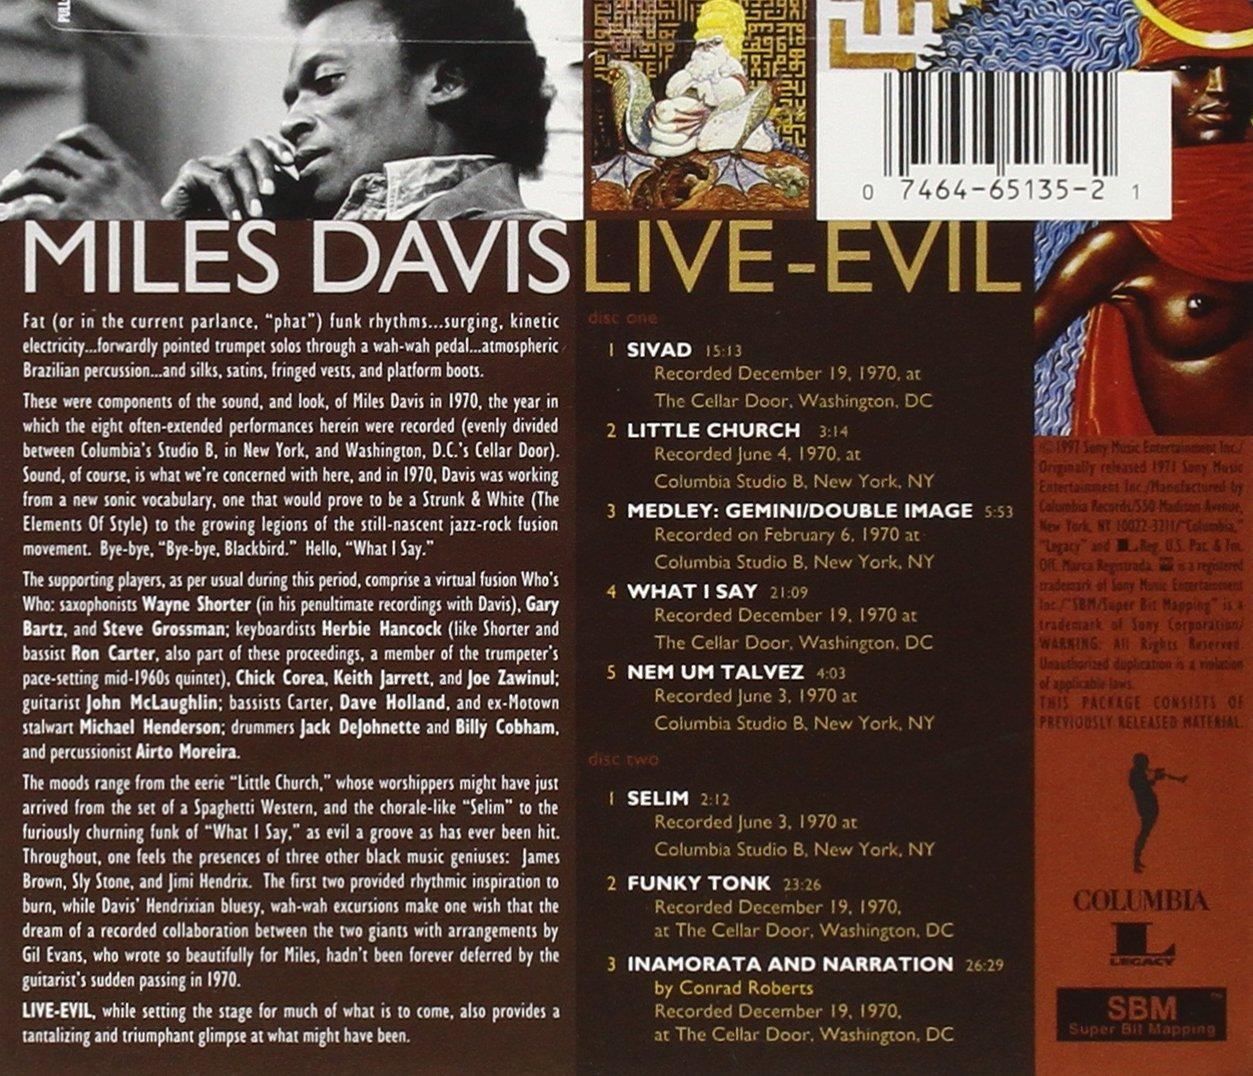 & Miles Davis - Live - Evil - Amazon.com Music